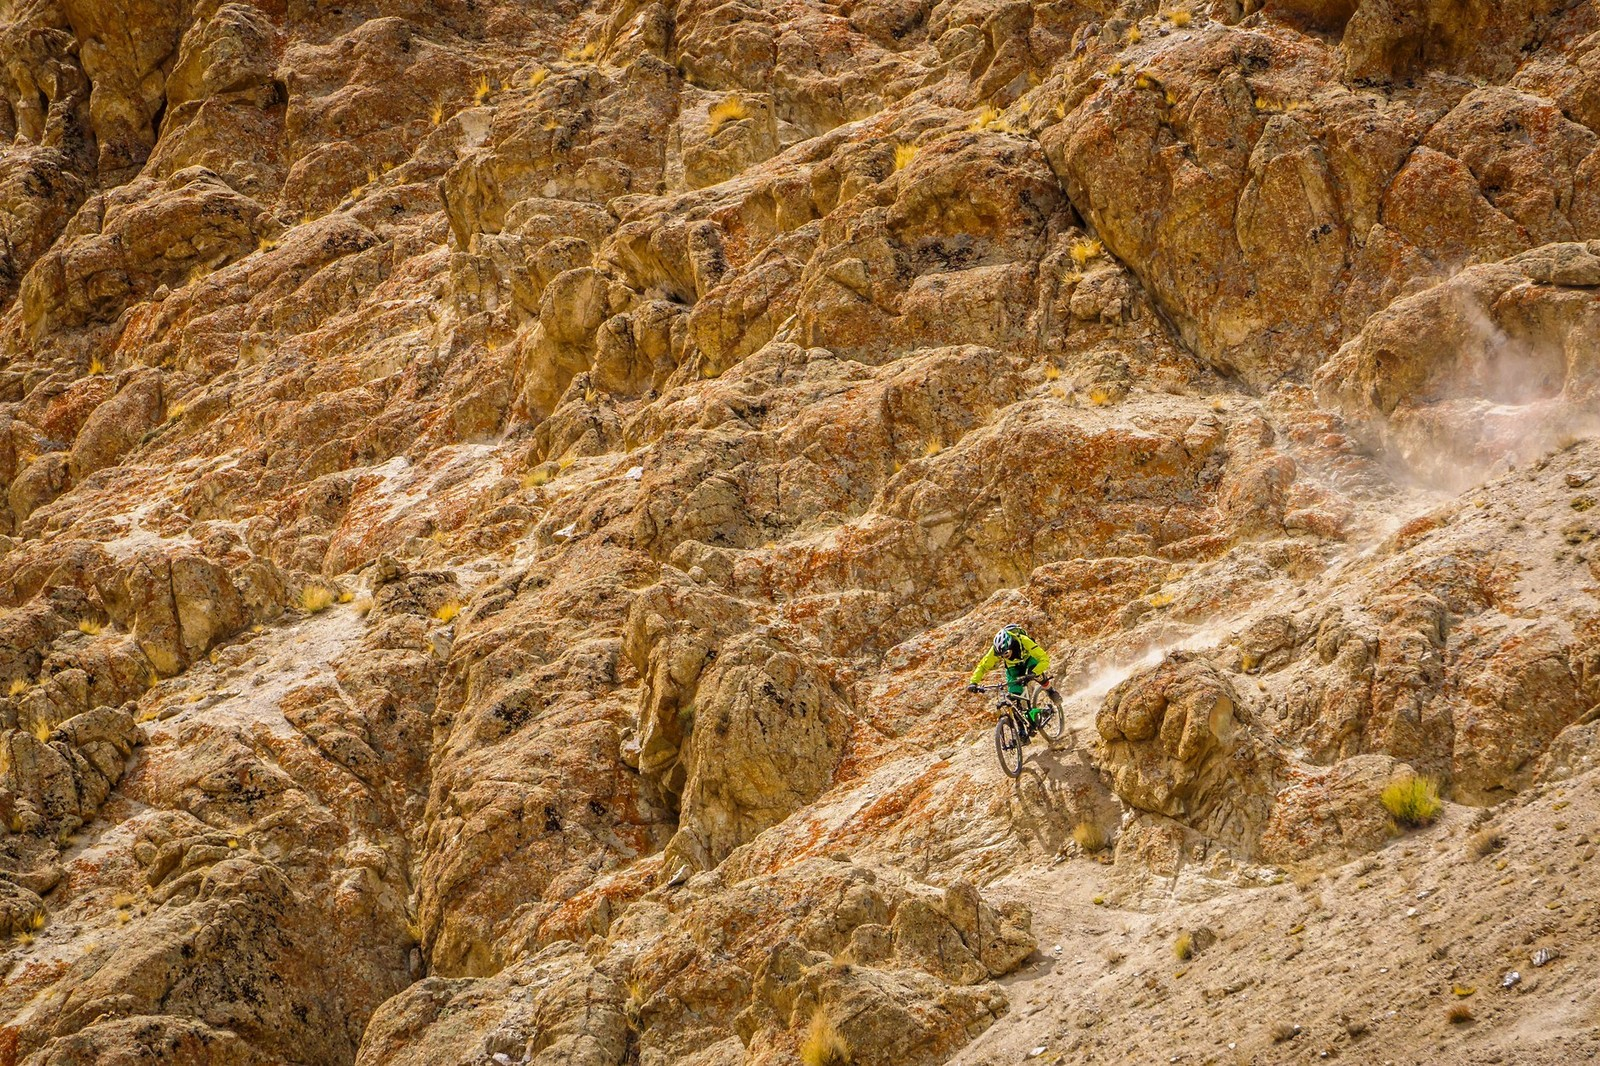 Vinay Menon - Malcolm Mclaws - Mountain Biking Pictures - Vital MTB